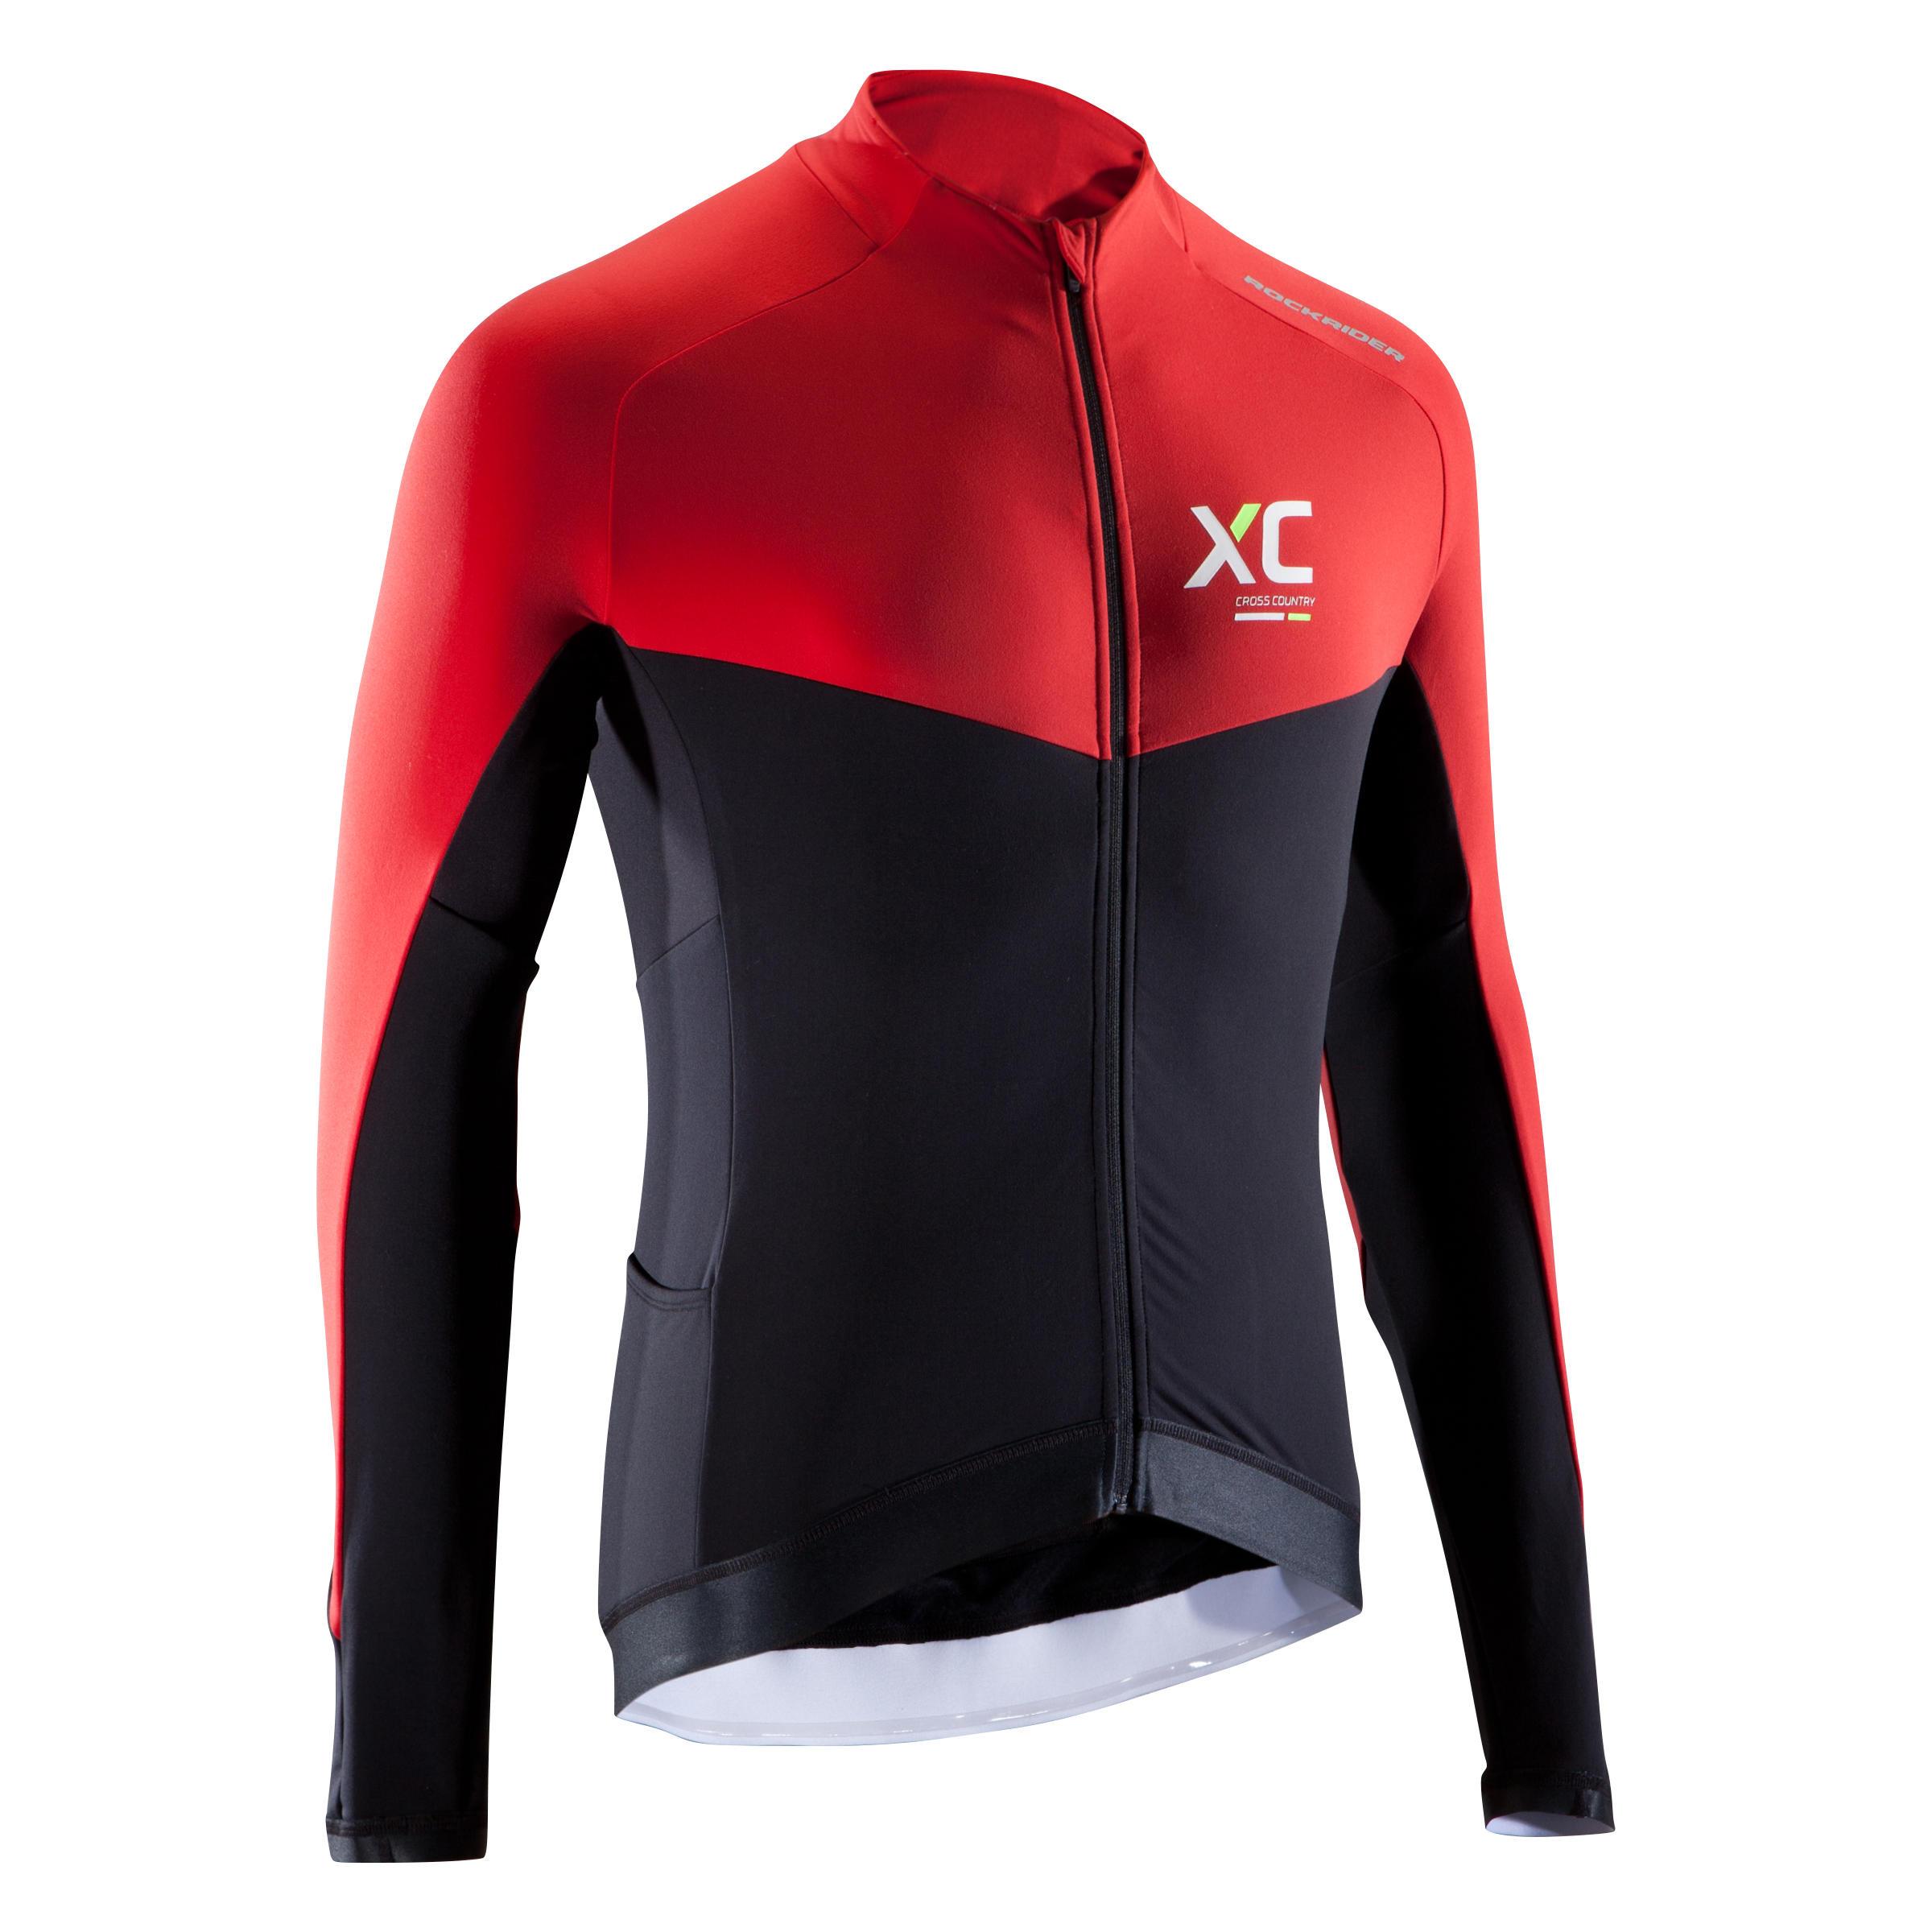 Rockrider MTB-shirt XC zwart/rood